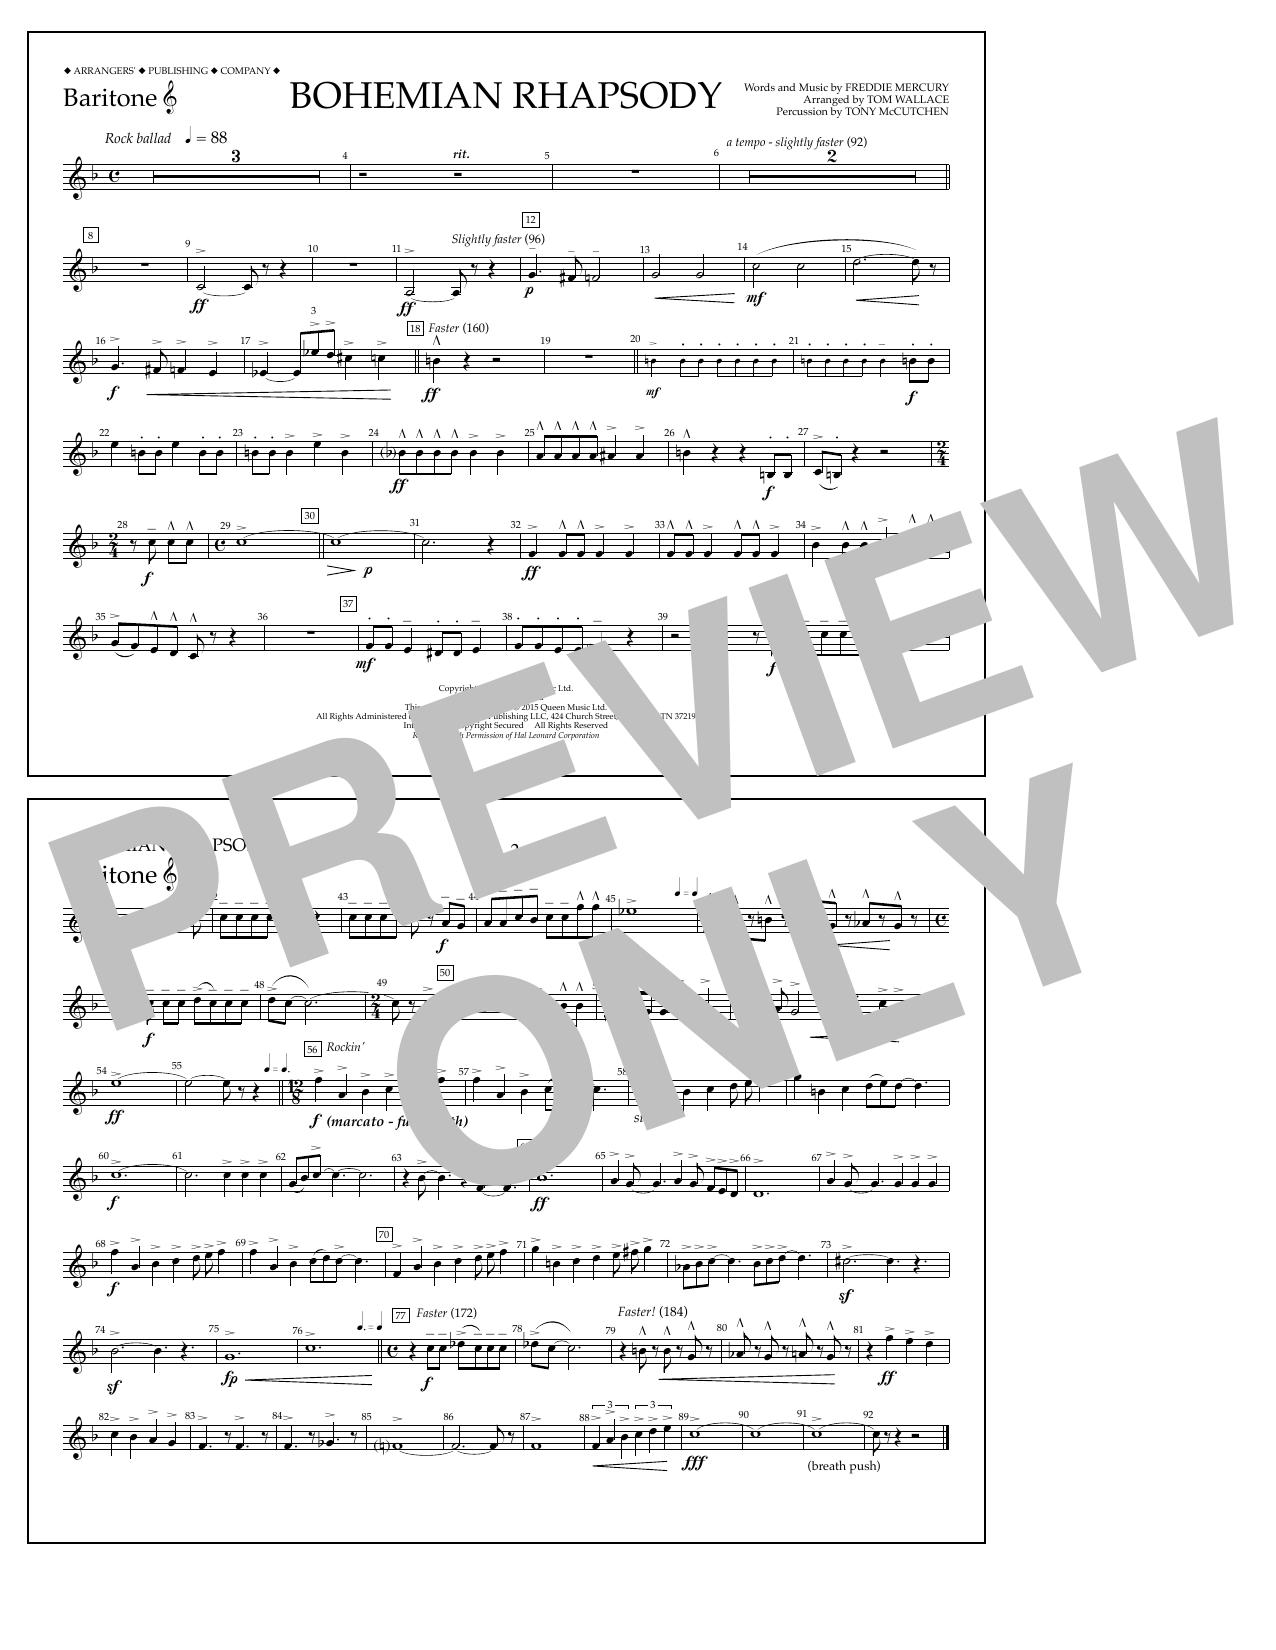 Bohemian Rhapsody - Baritone T.C. (Marching Band)